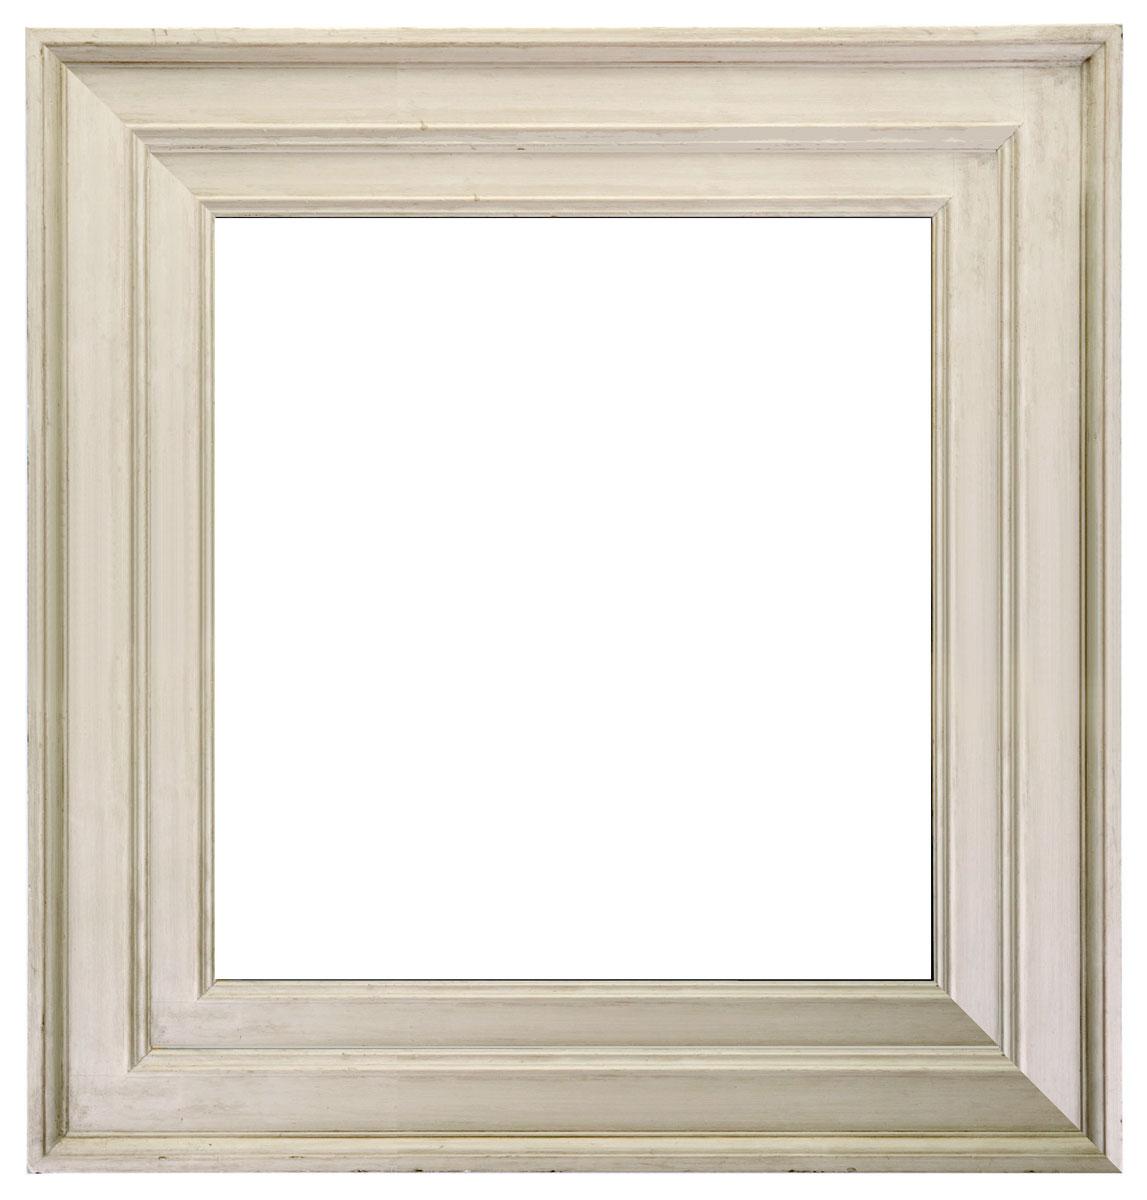 John davies framing frame gallery painted jeuxipadfo Images